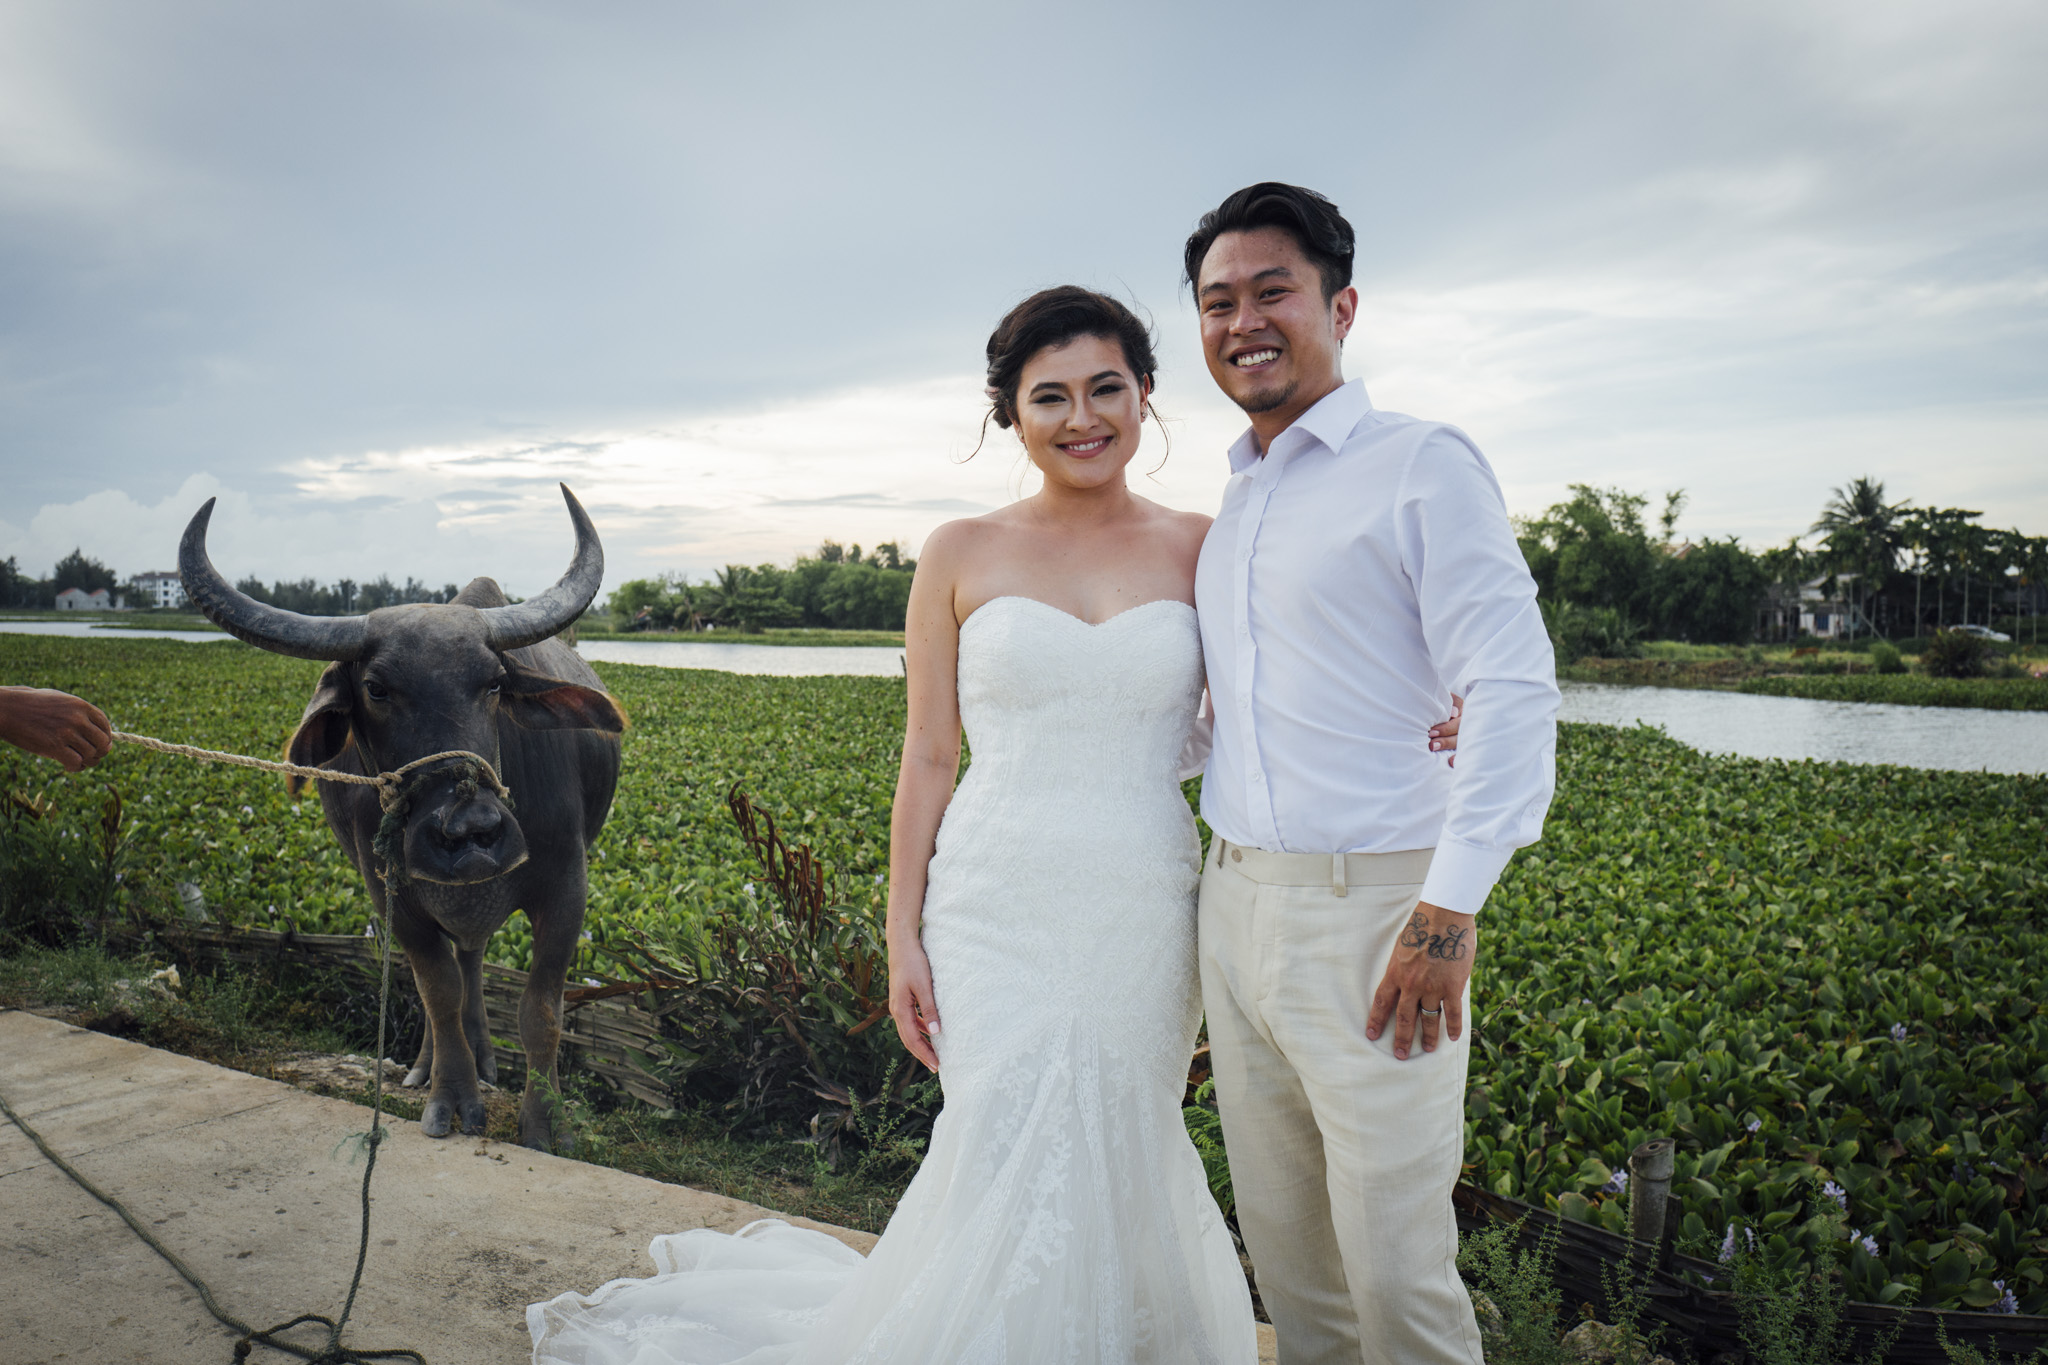 Trang & Chris -1-269.jpg